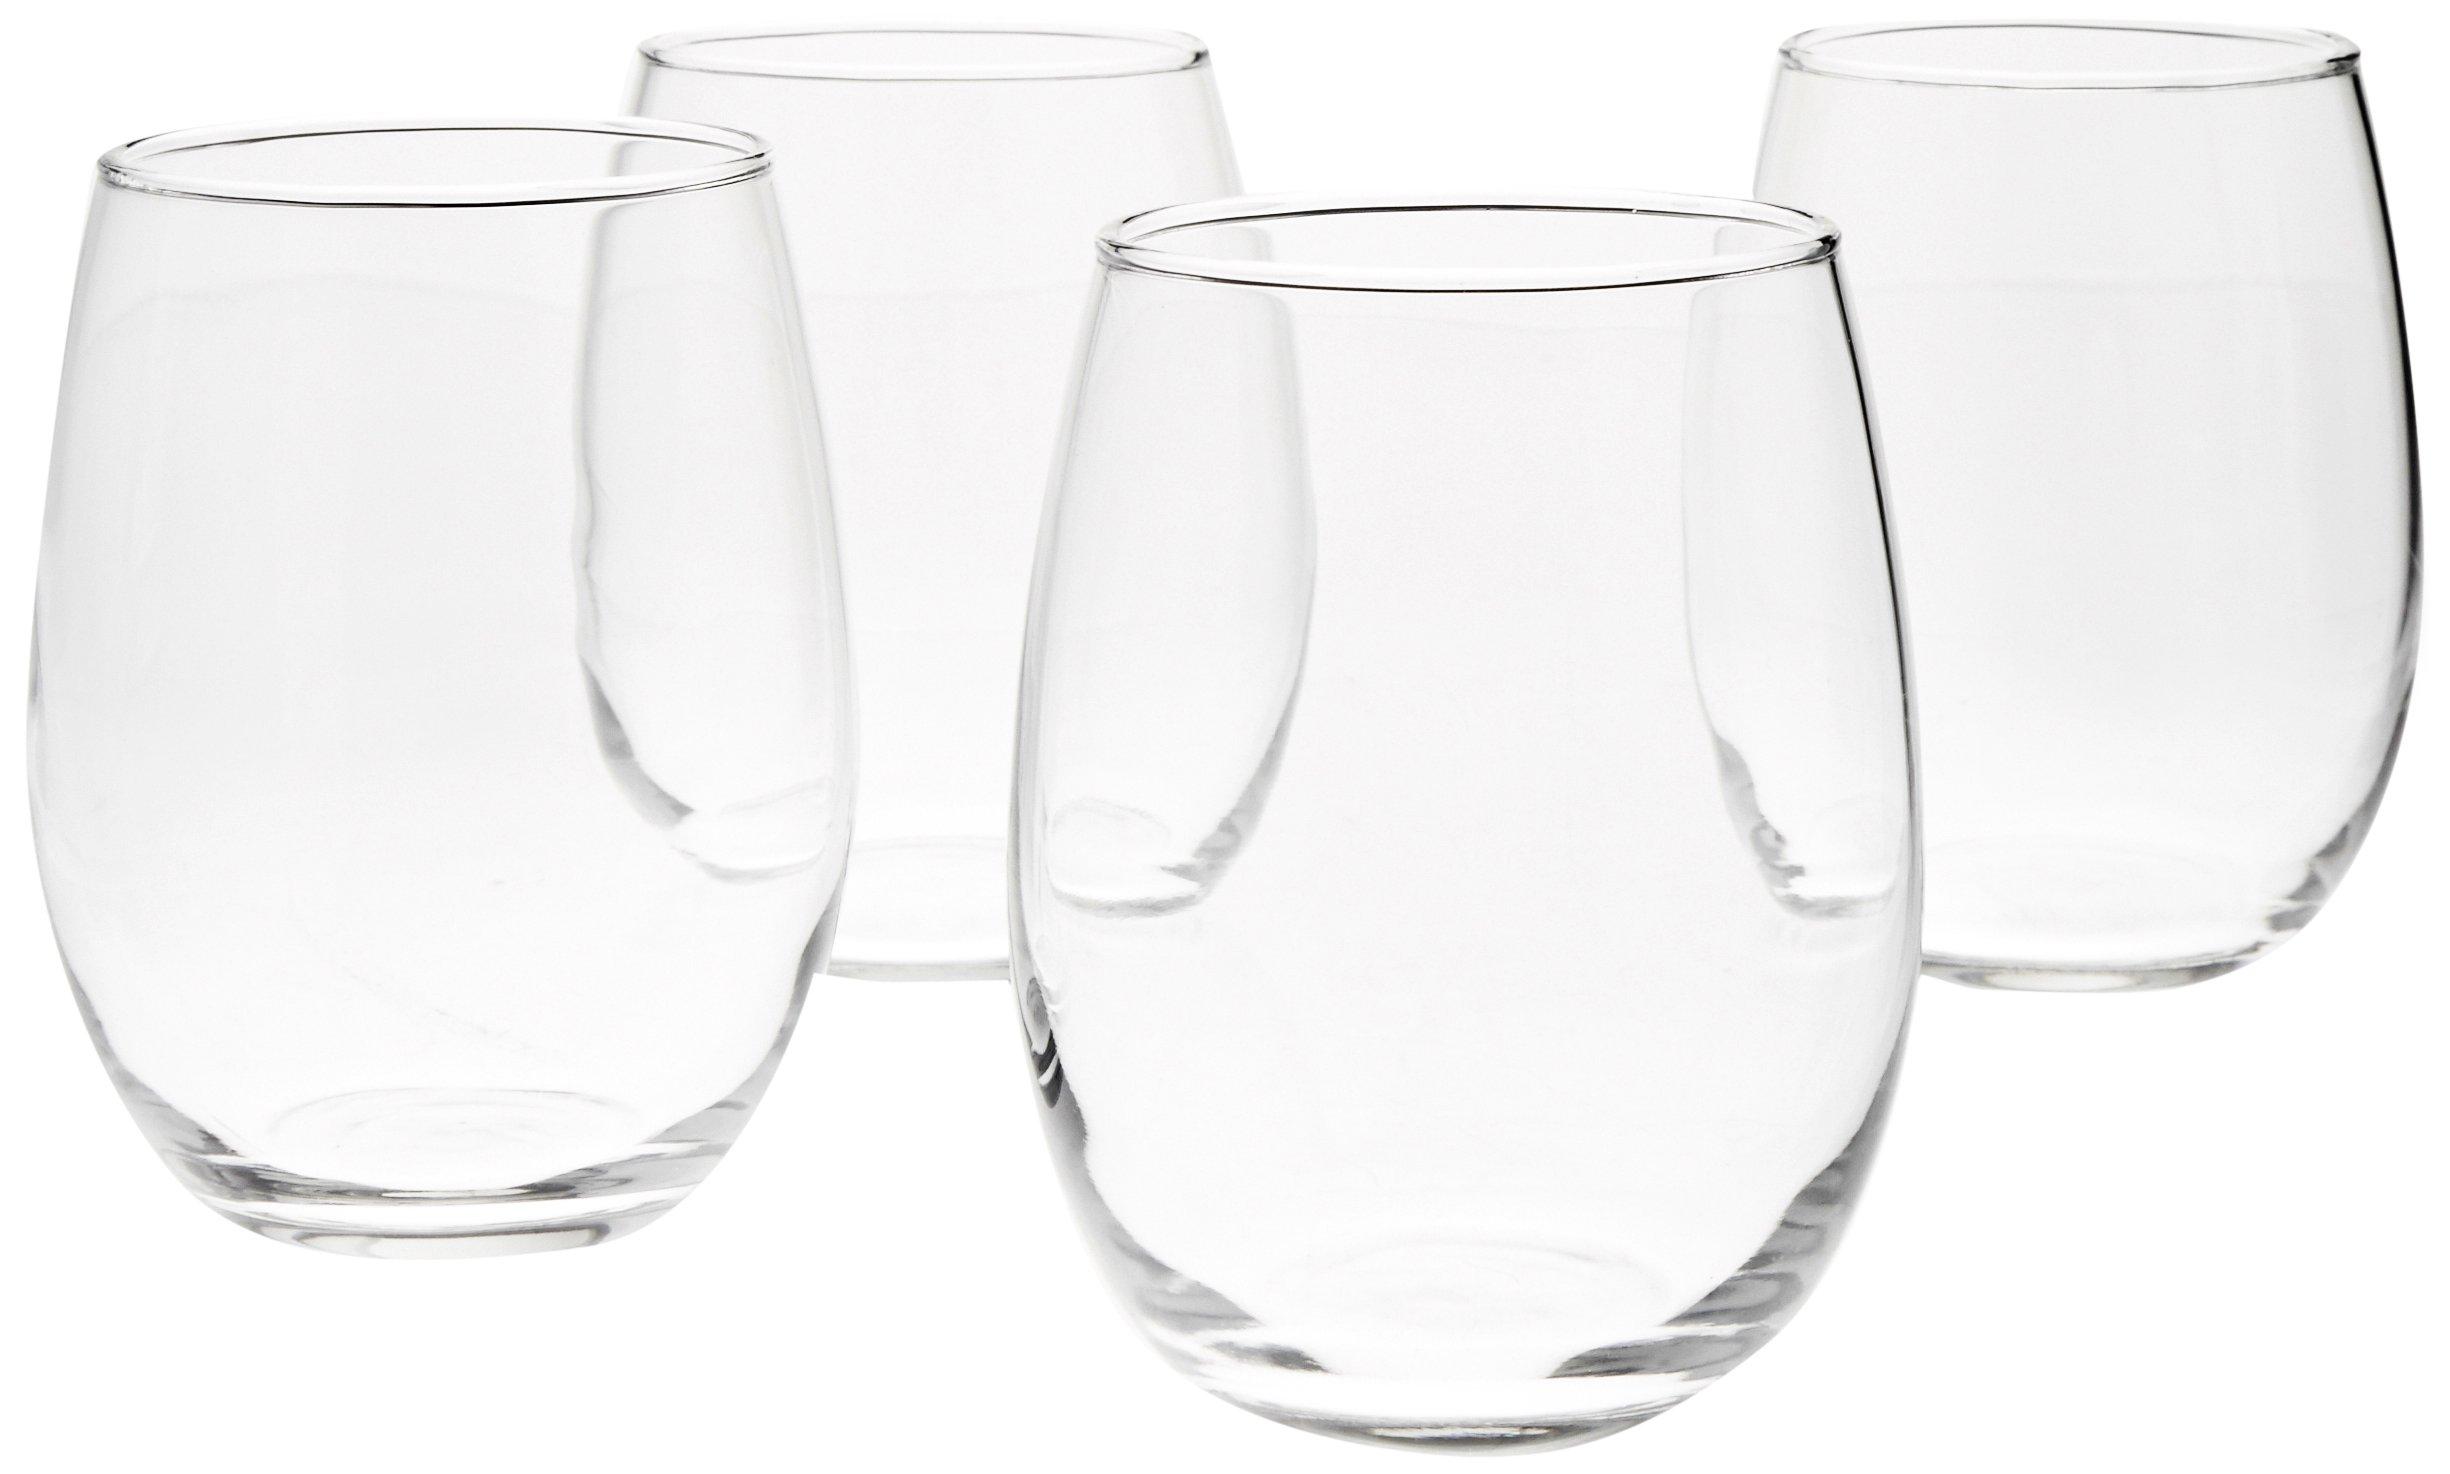 AmazonBasics Stemless Wine Glasses, 15-Ounce - Set of 4